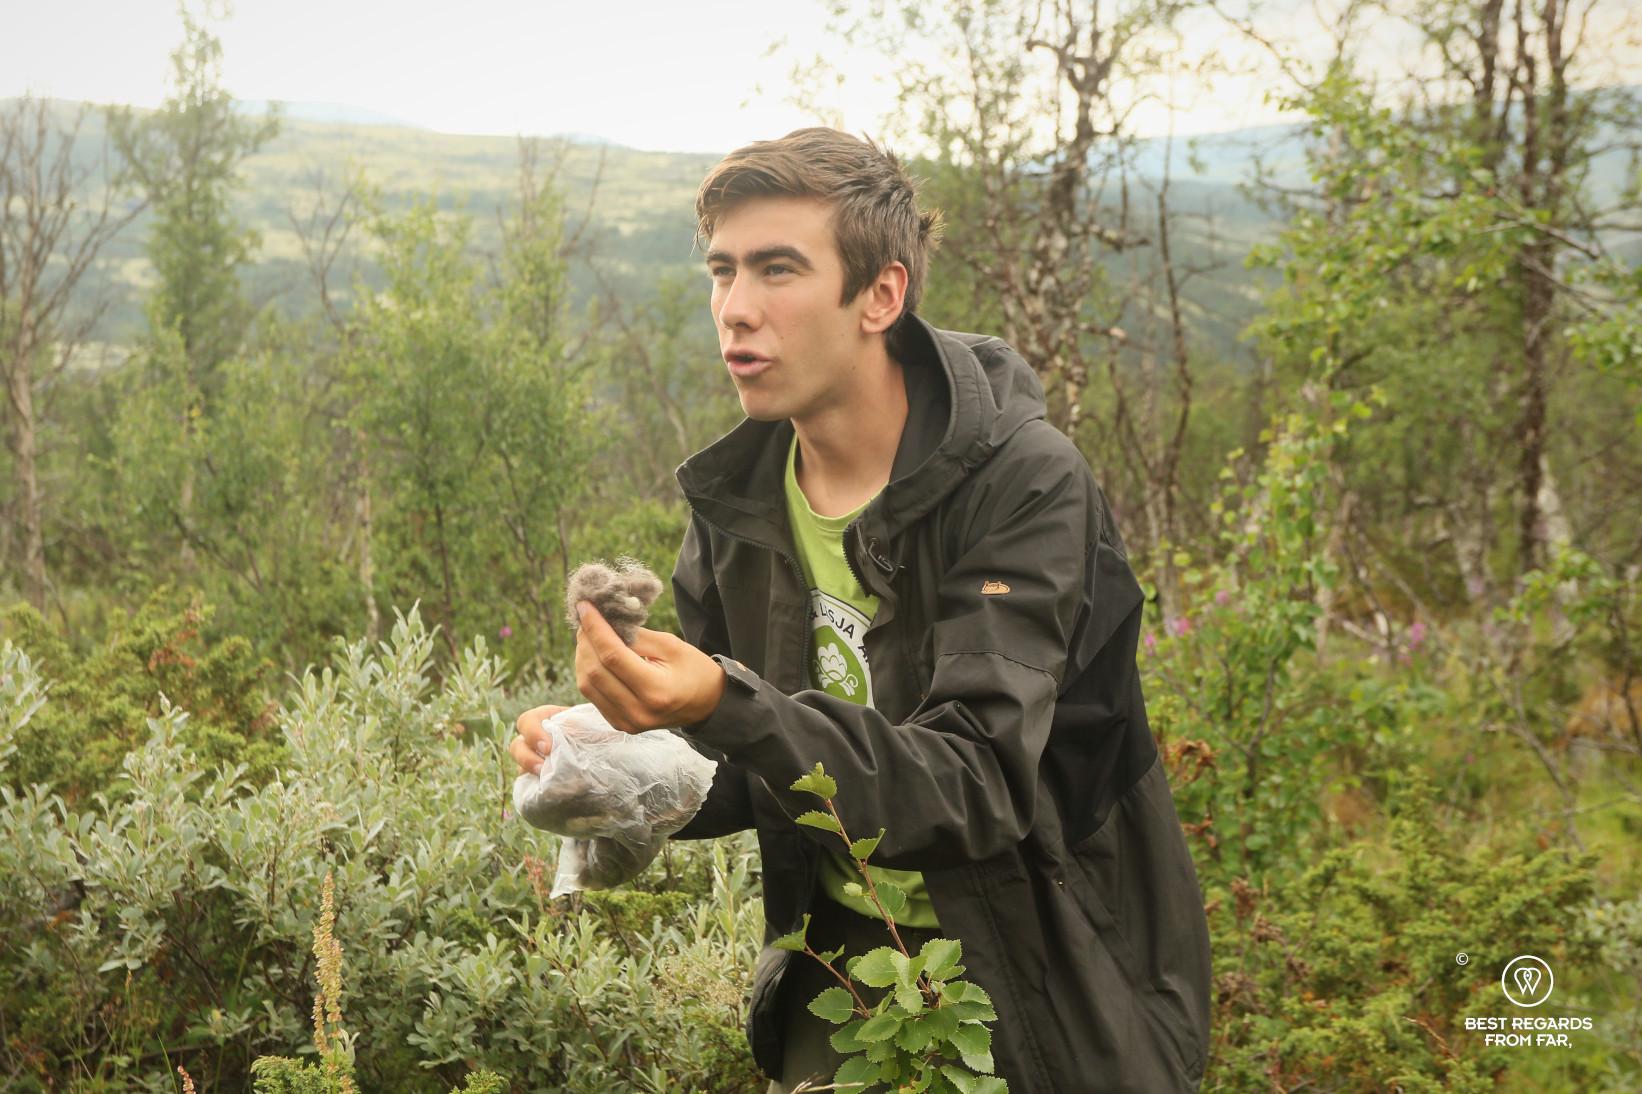 Safari guide showing musk ox hairs